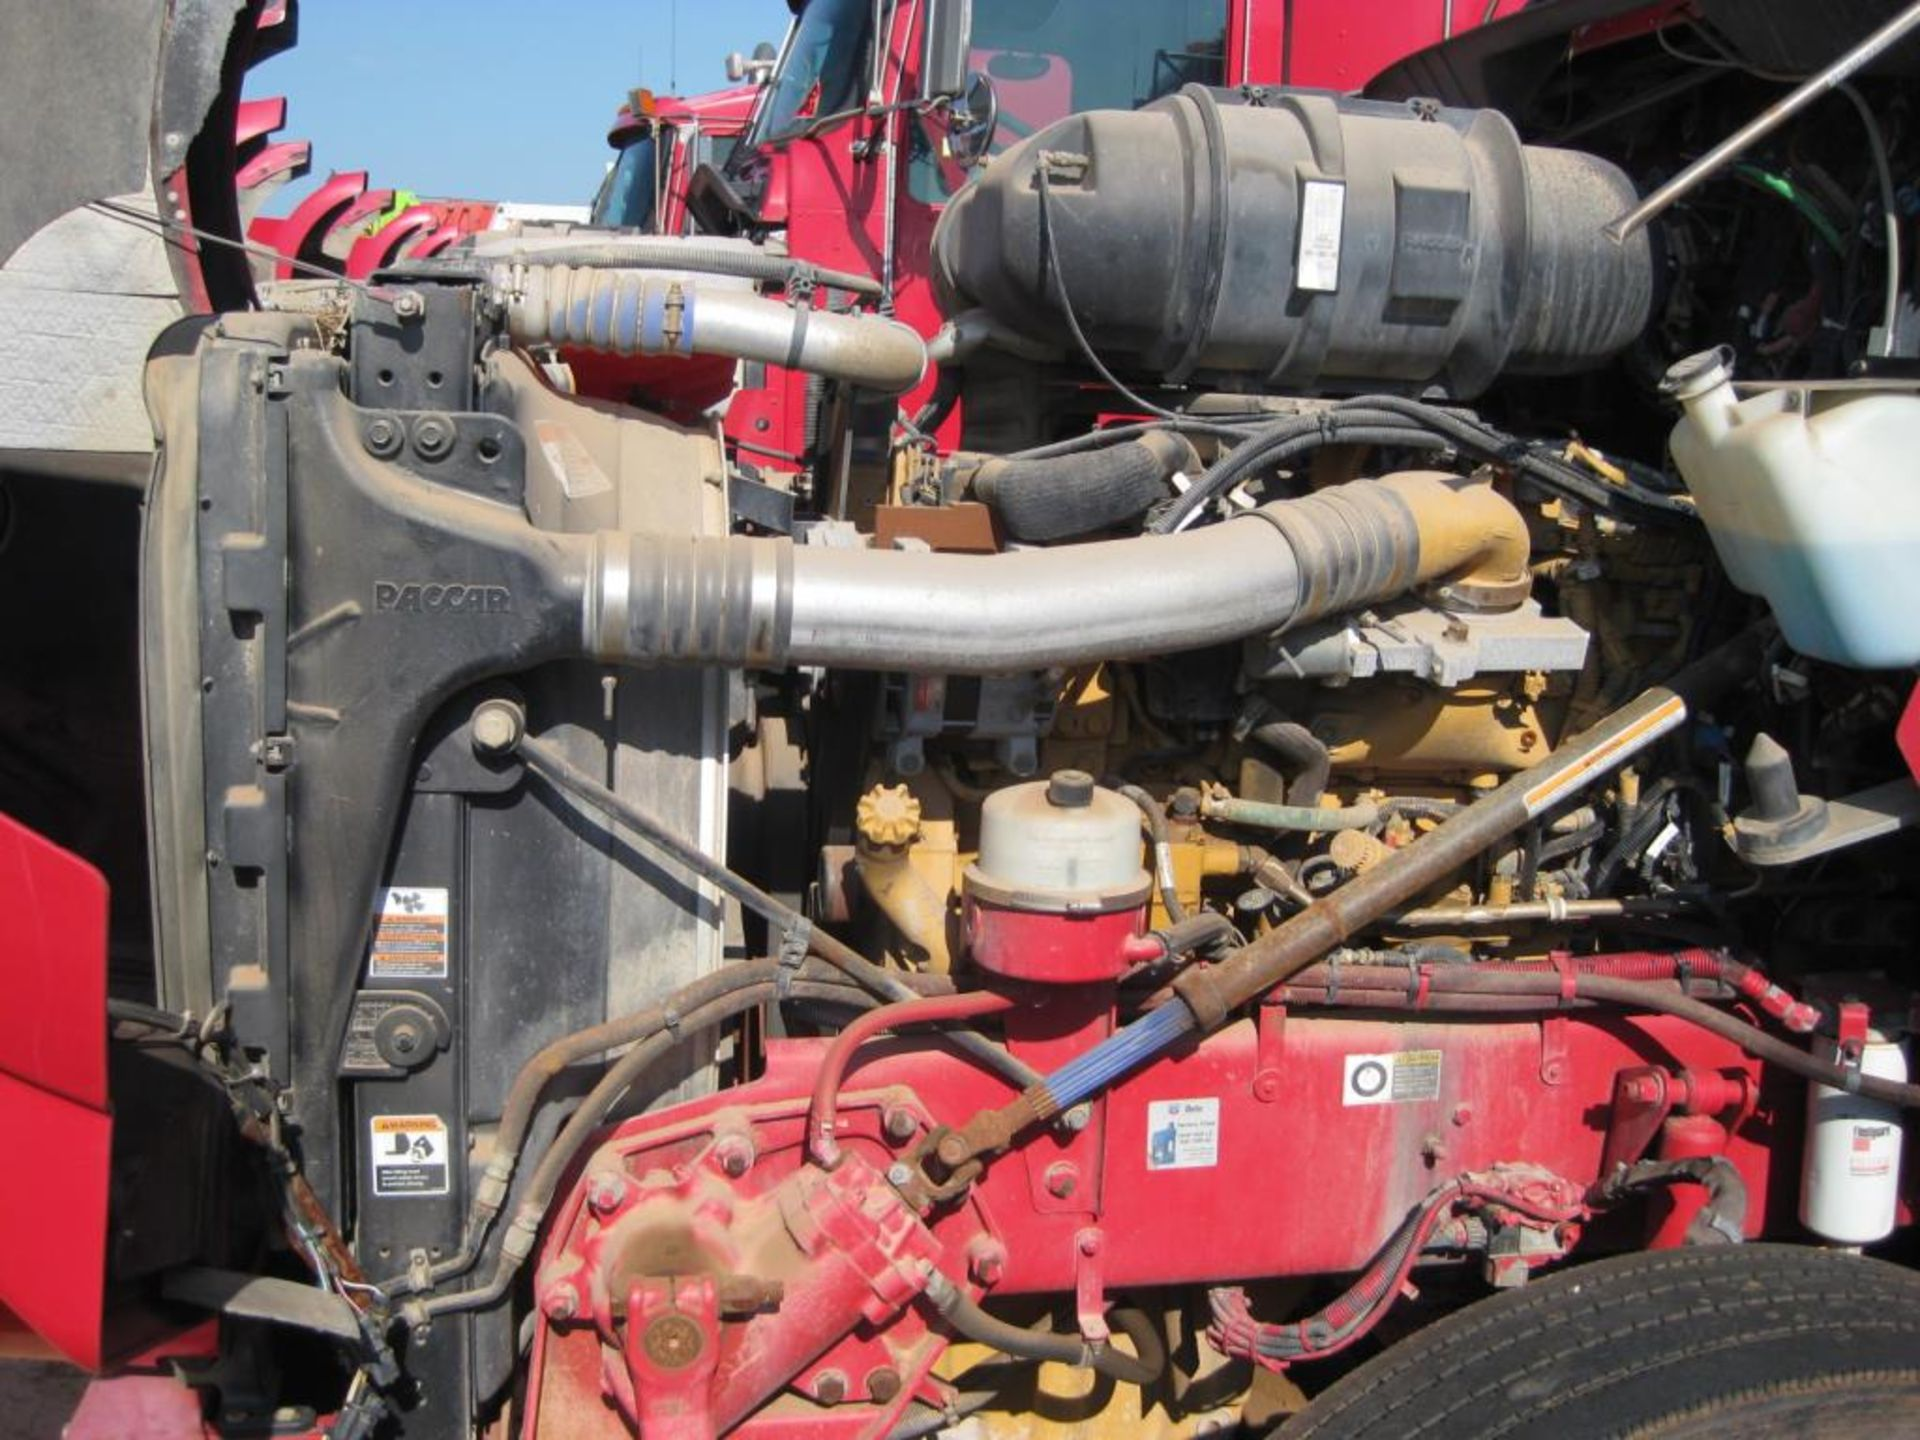 Kenworth Winch Truck - Image 25 of 27